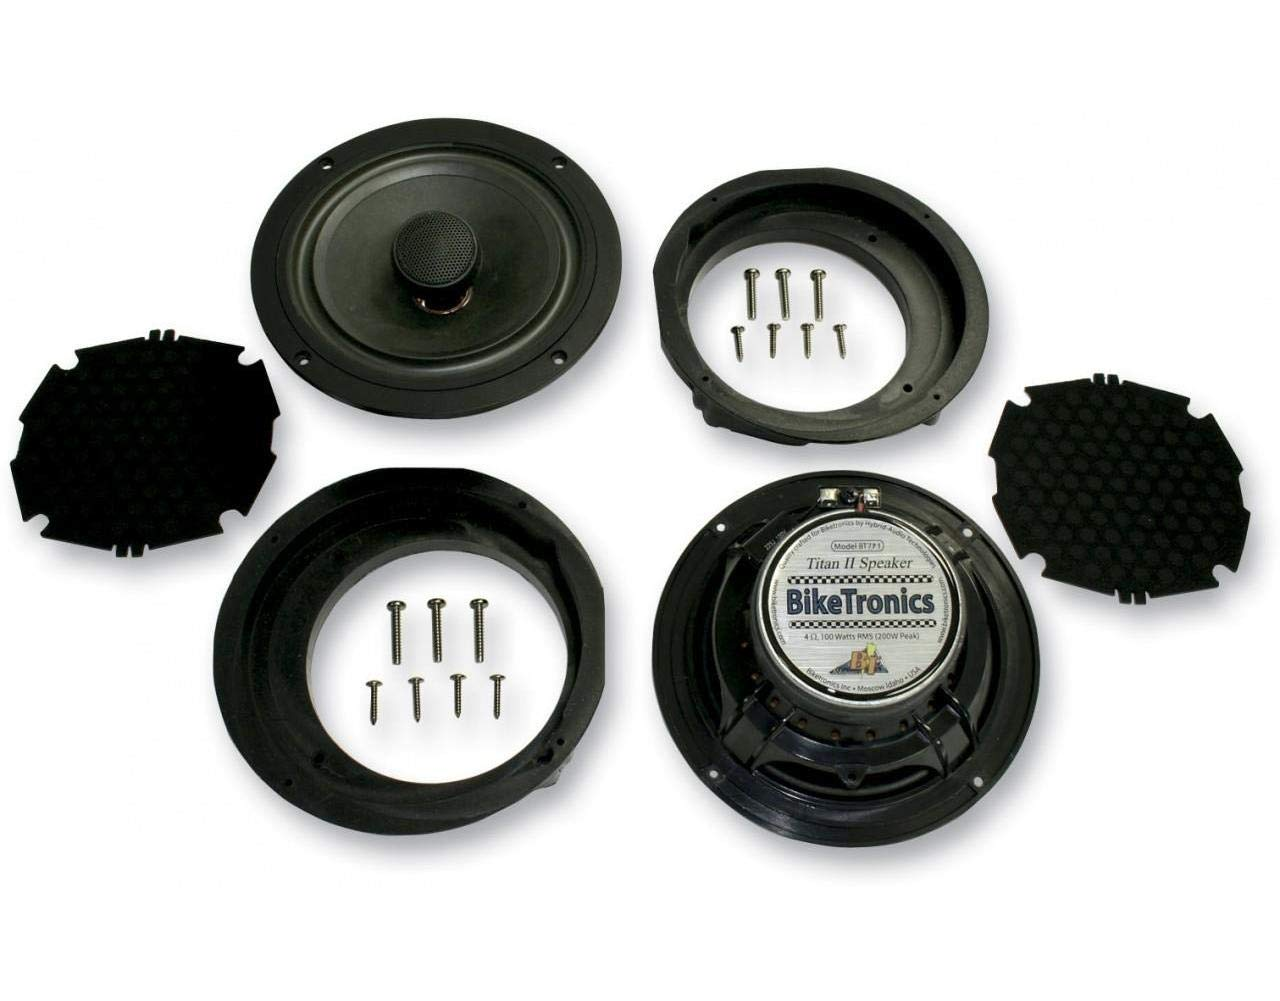 3. Biketronics Titan II 7.1in. Speaker BT7P1